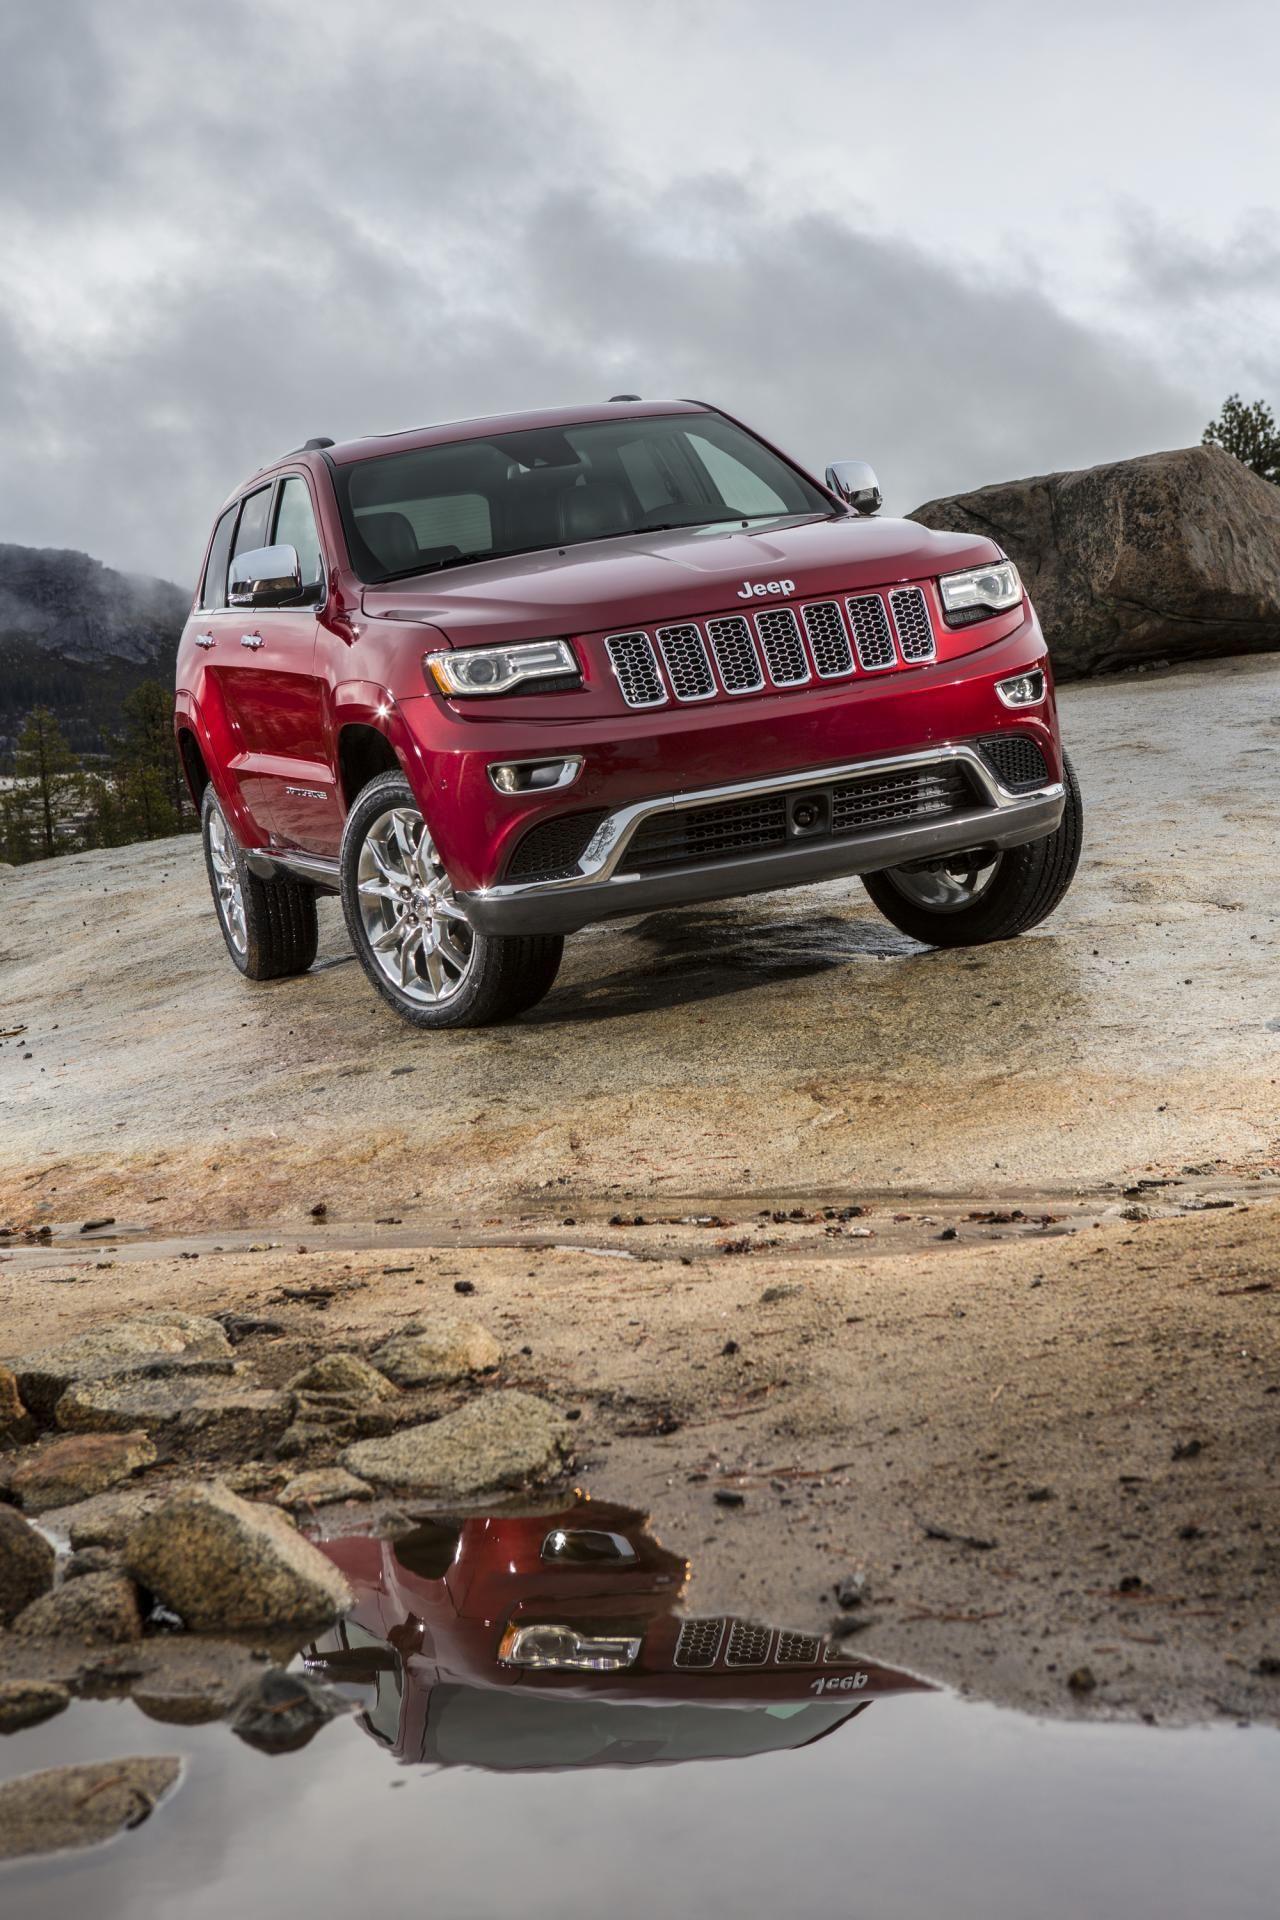 2014 jeep grand cherokee jeep cherokee rvinyl